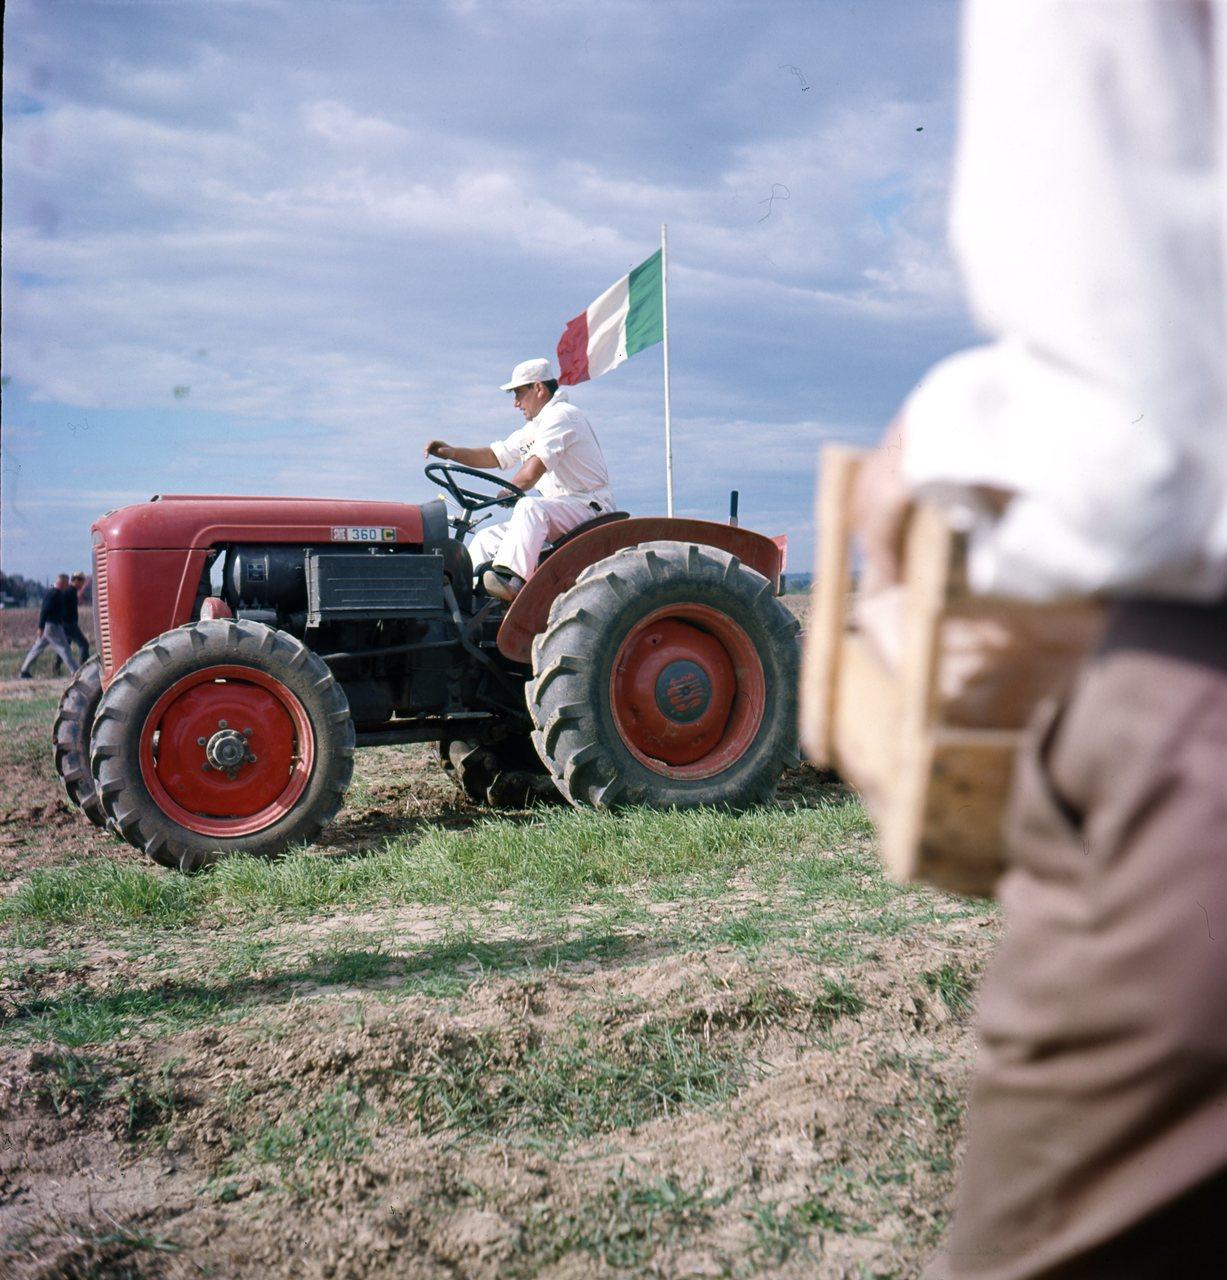 Fotocolor SAME - Gara di motoaratura a Roma, 3/12/65